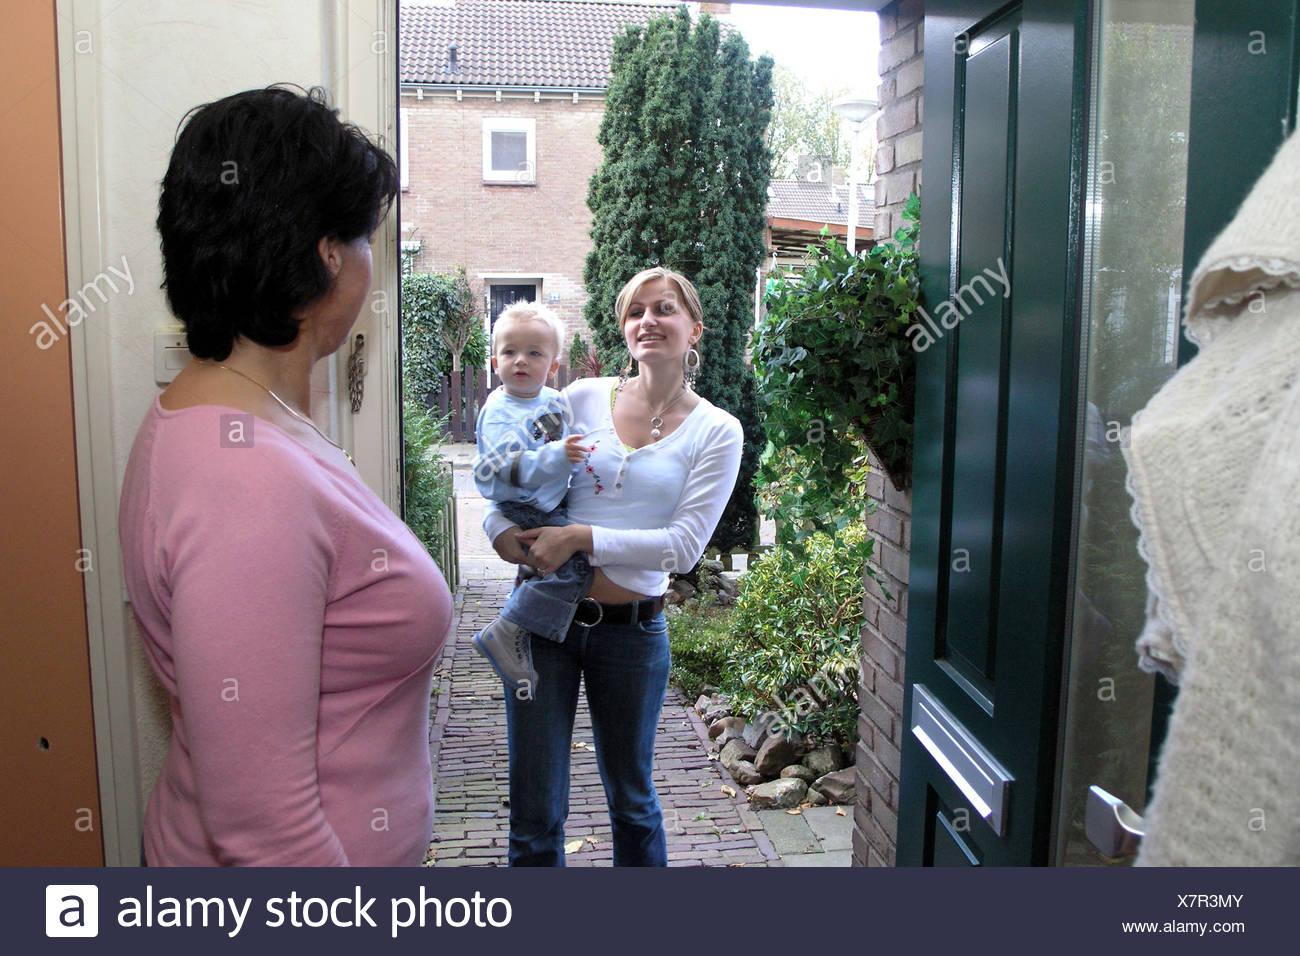 Daughter in law visit mother in law, standing at frontdoor talking on doorstep - Stock Image